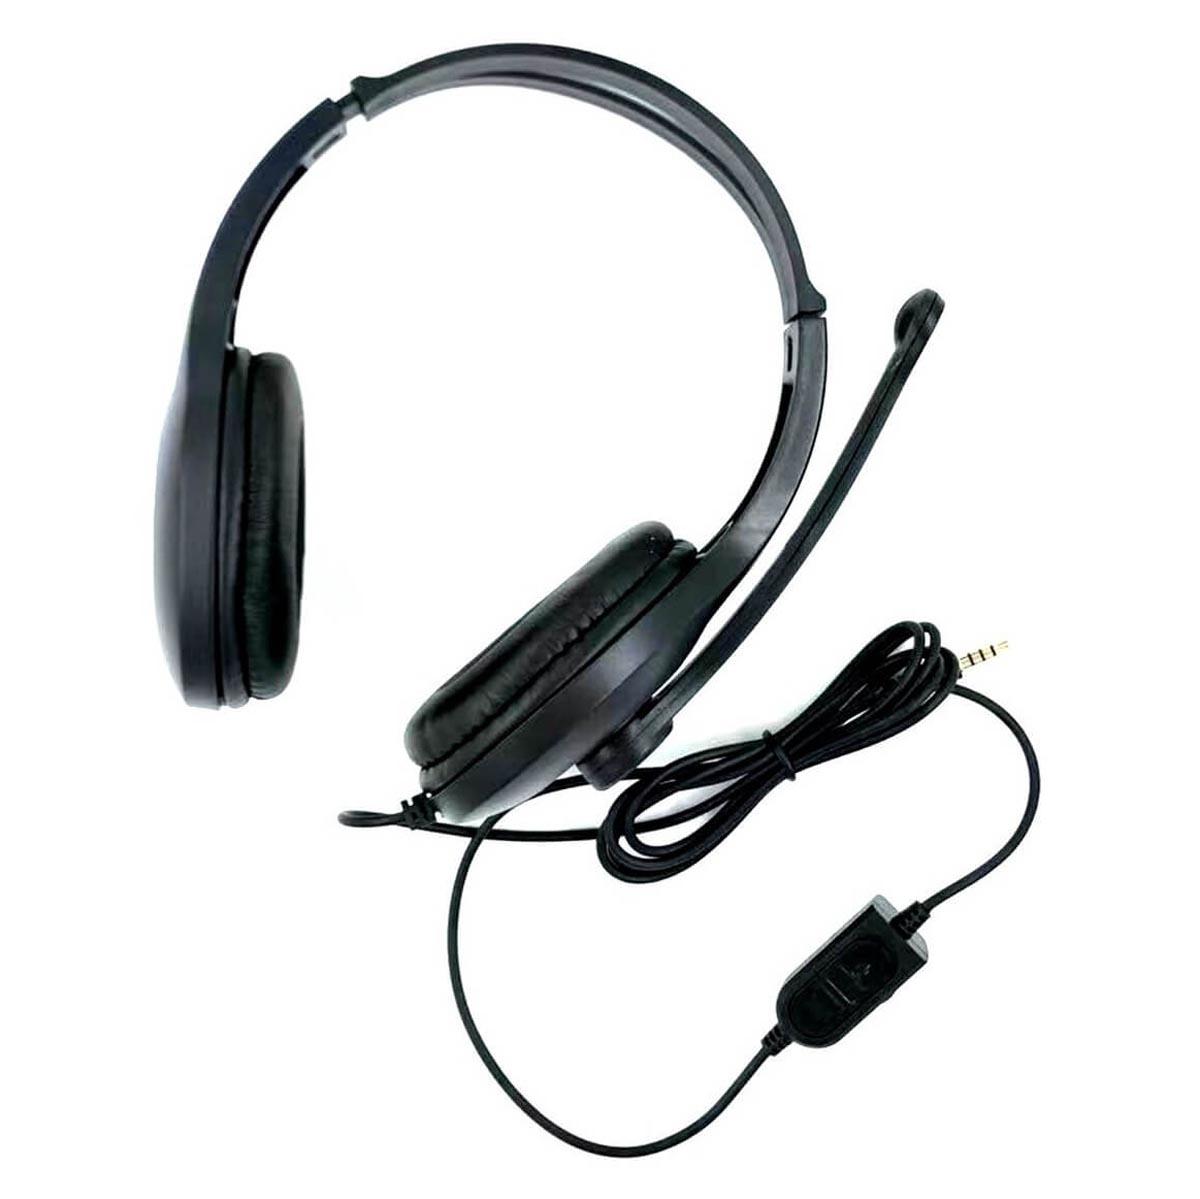 Fone de Ouvido Gamer Headset Para PS4 e XBOX One P3 FON-9024 Basike